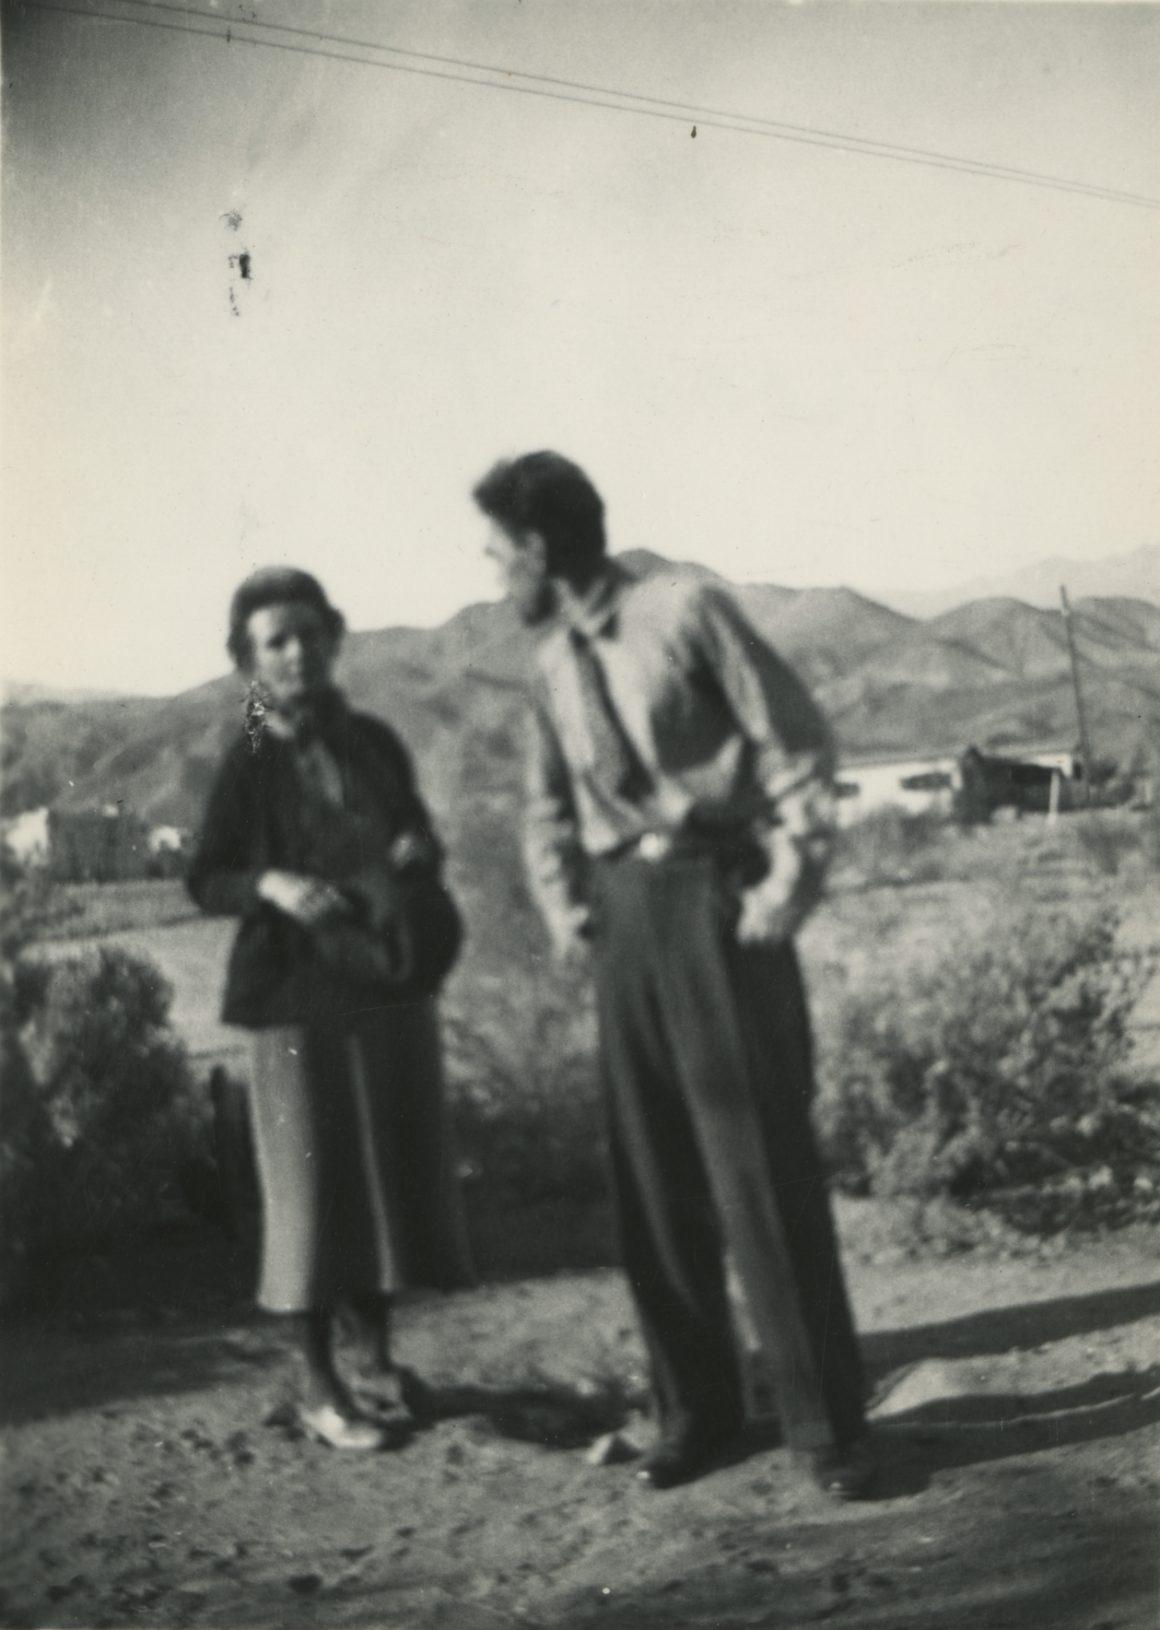 Agnes Pelton and Raymond Jonson